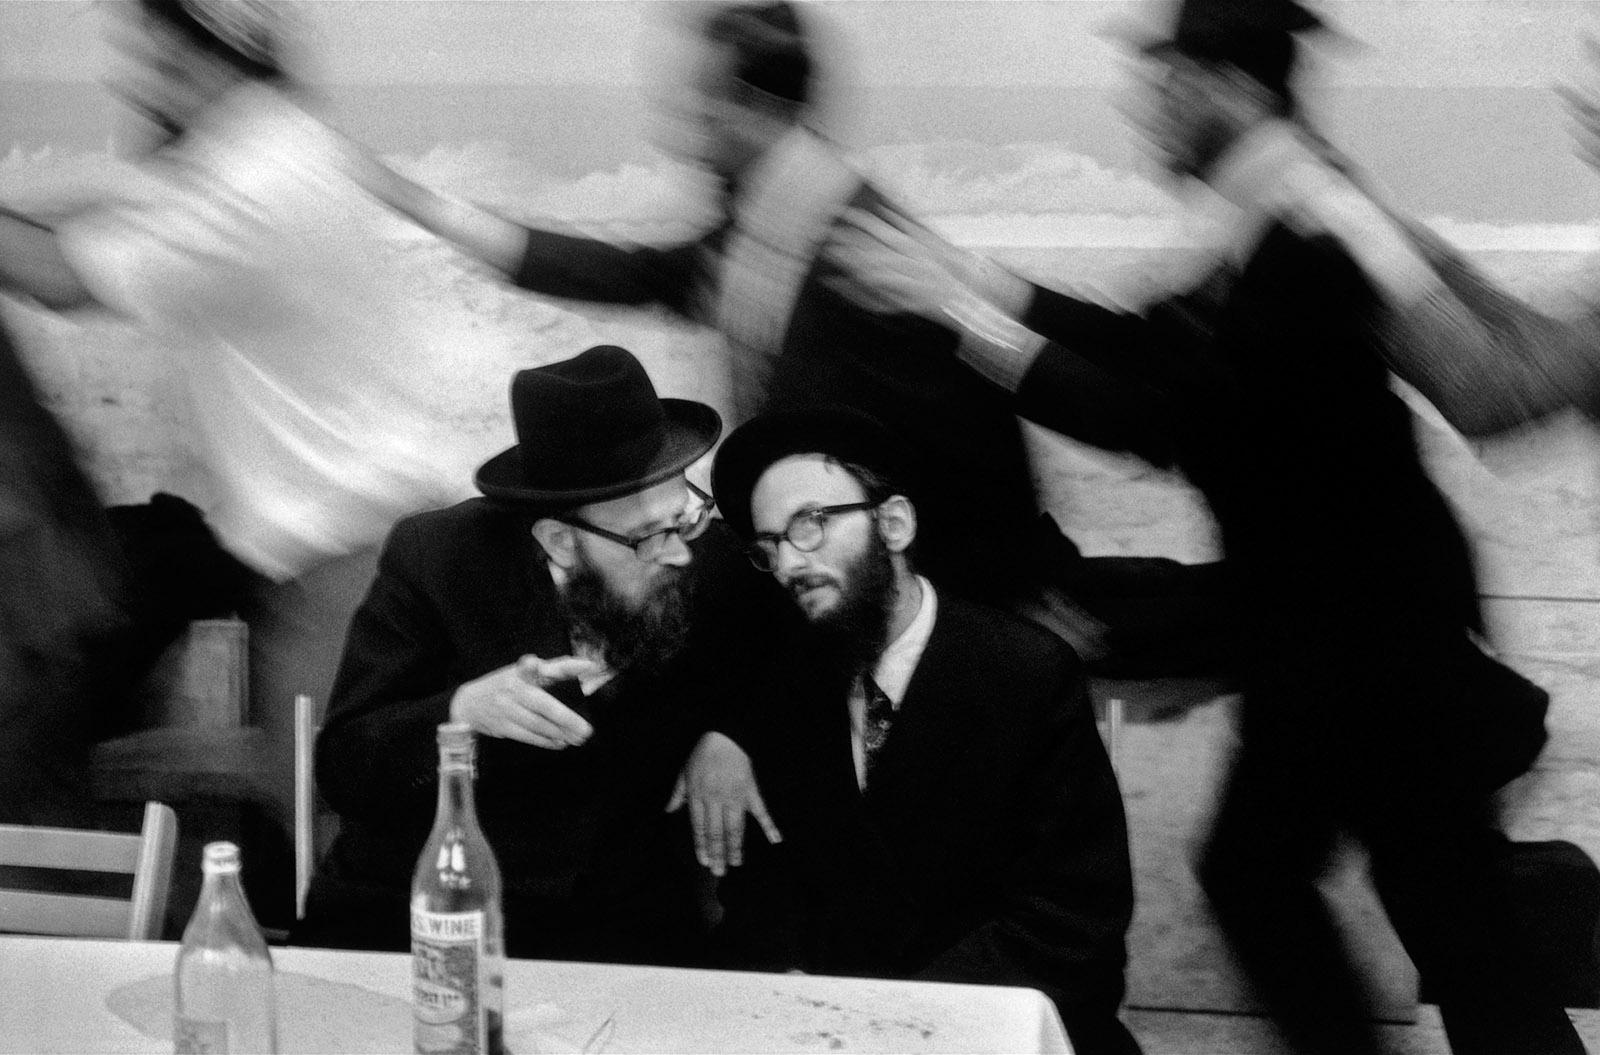 Jerusalem, 1972; photograph by Leonard Freed